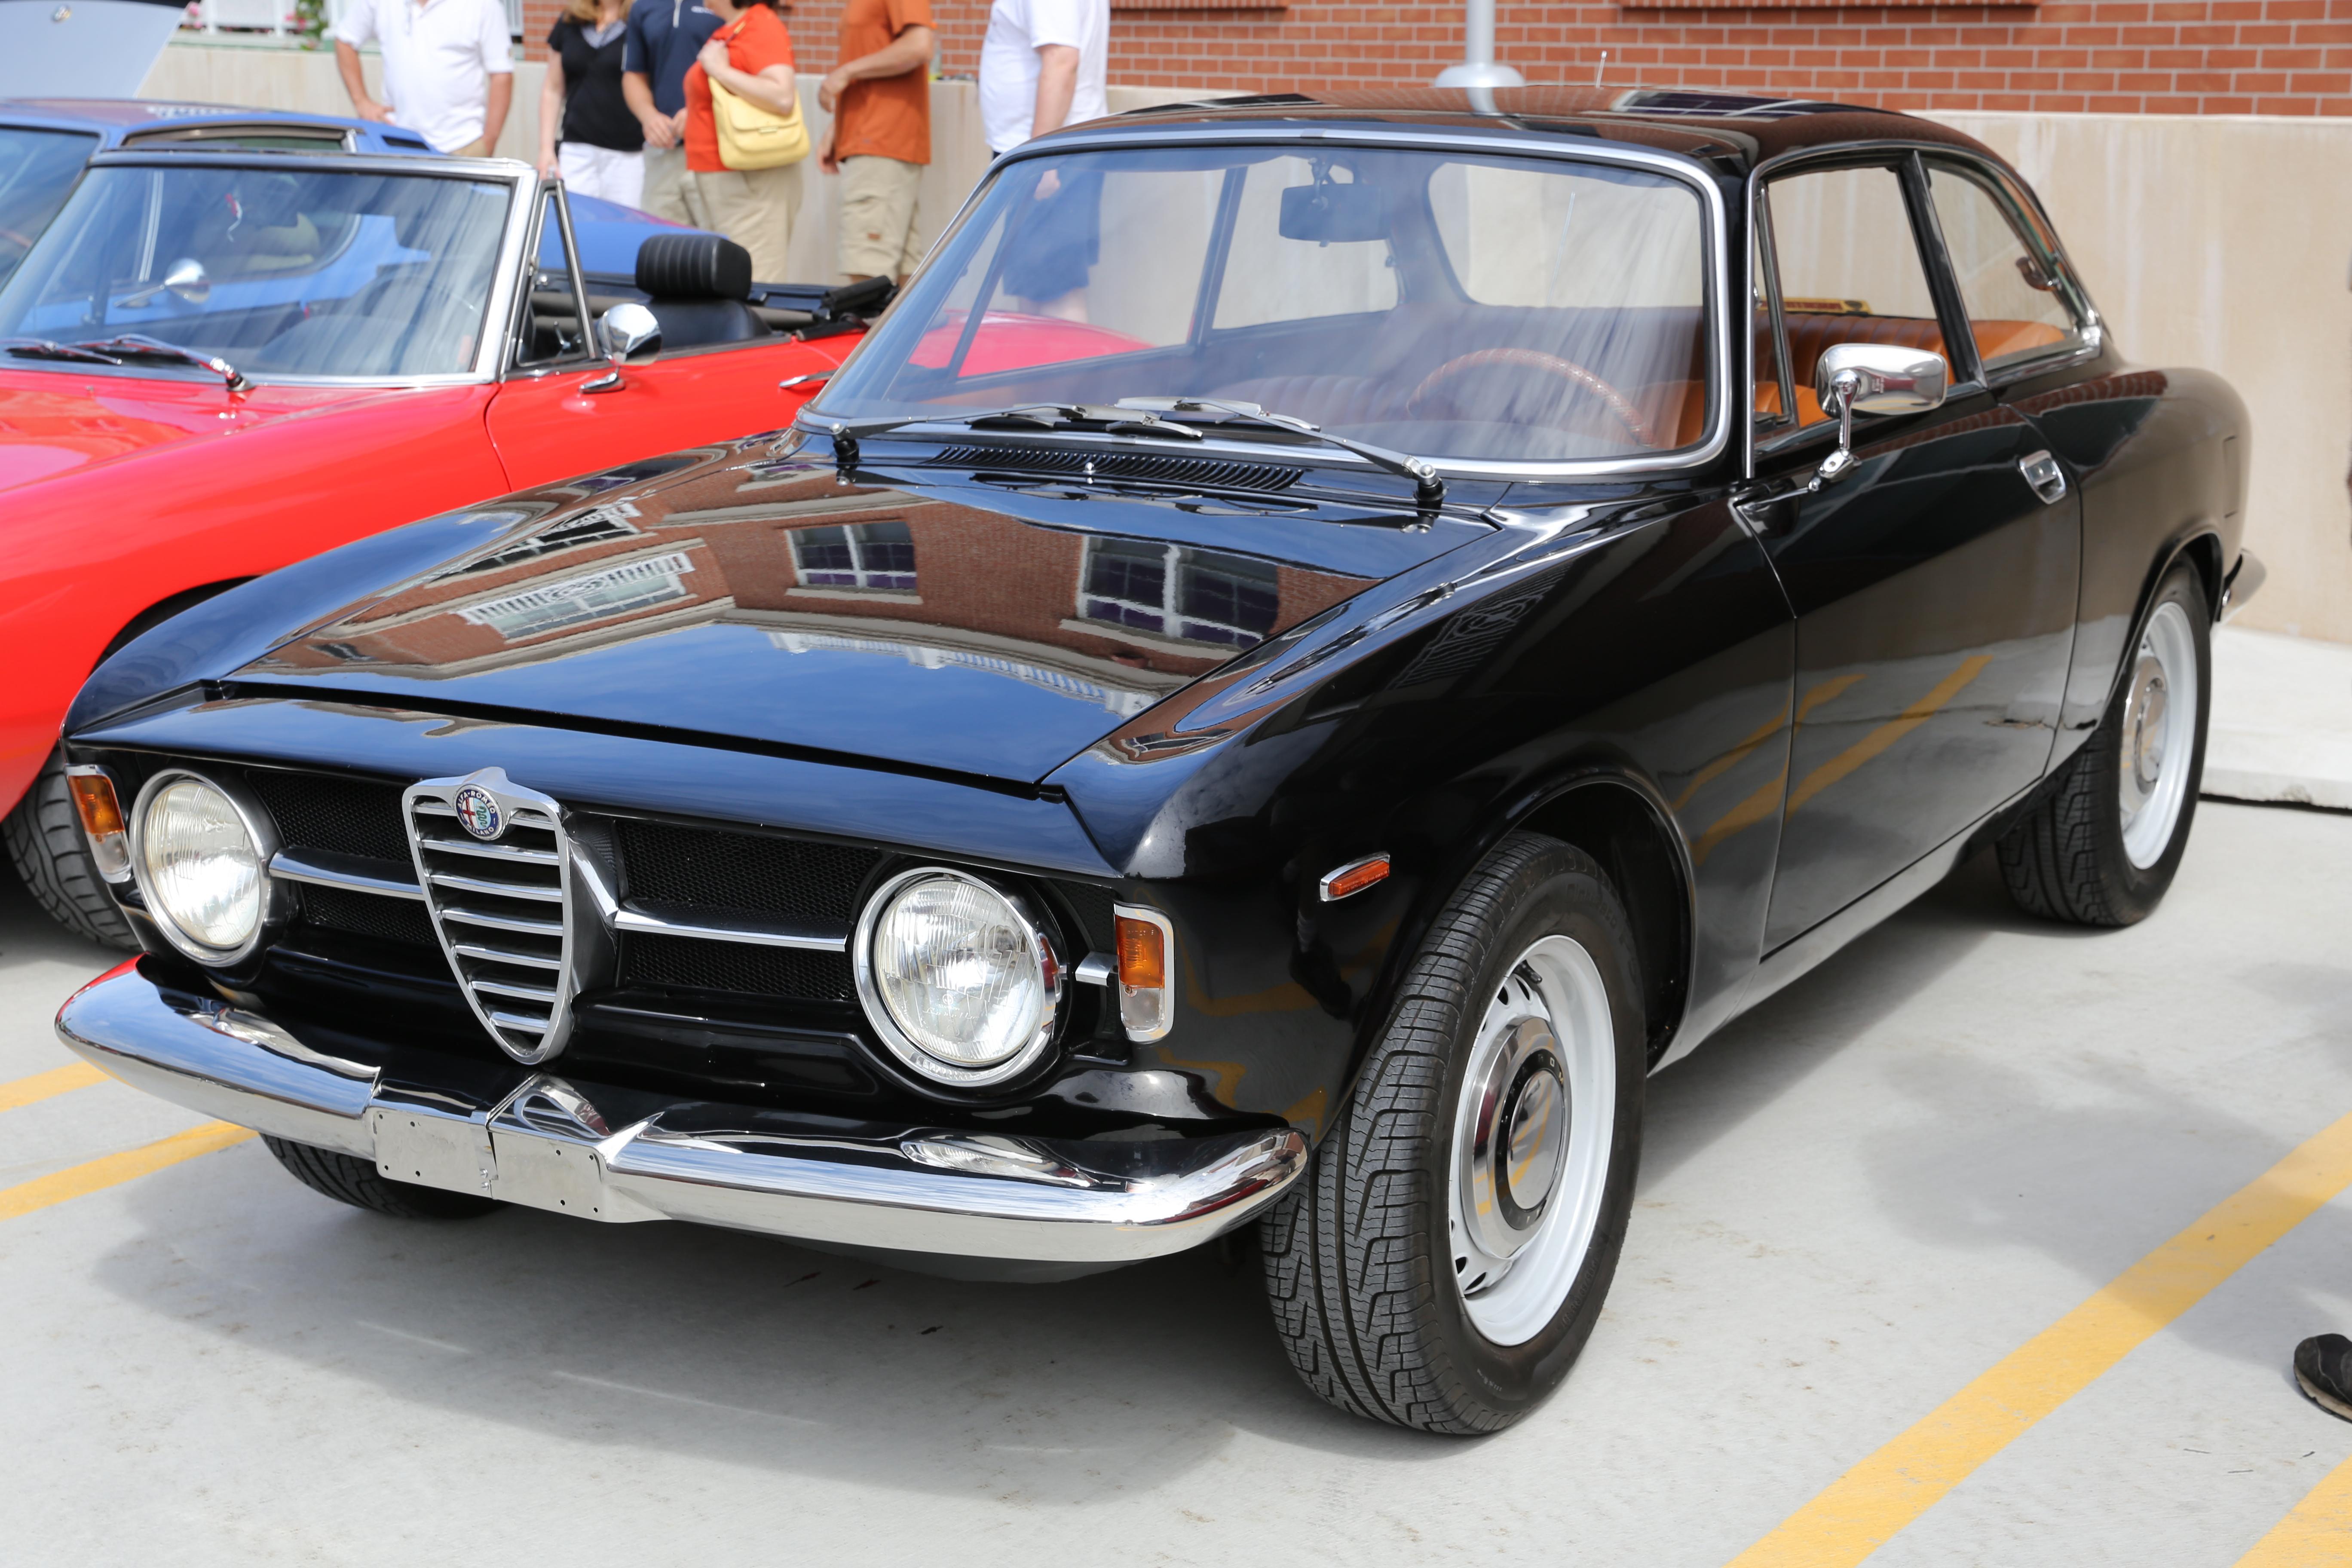 File:Ca. 1968 Alfa Romeo 1300 GT Junior (9601962401).jpg - Wikimedia Commons